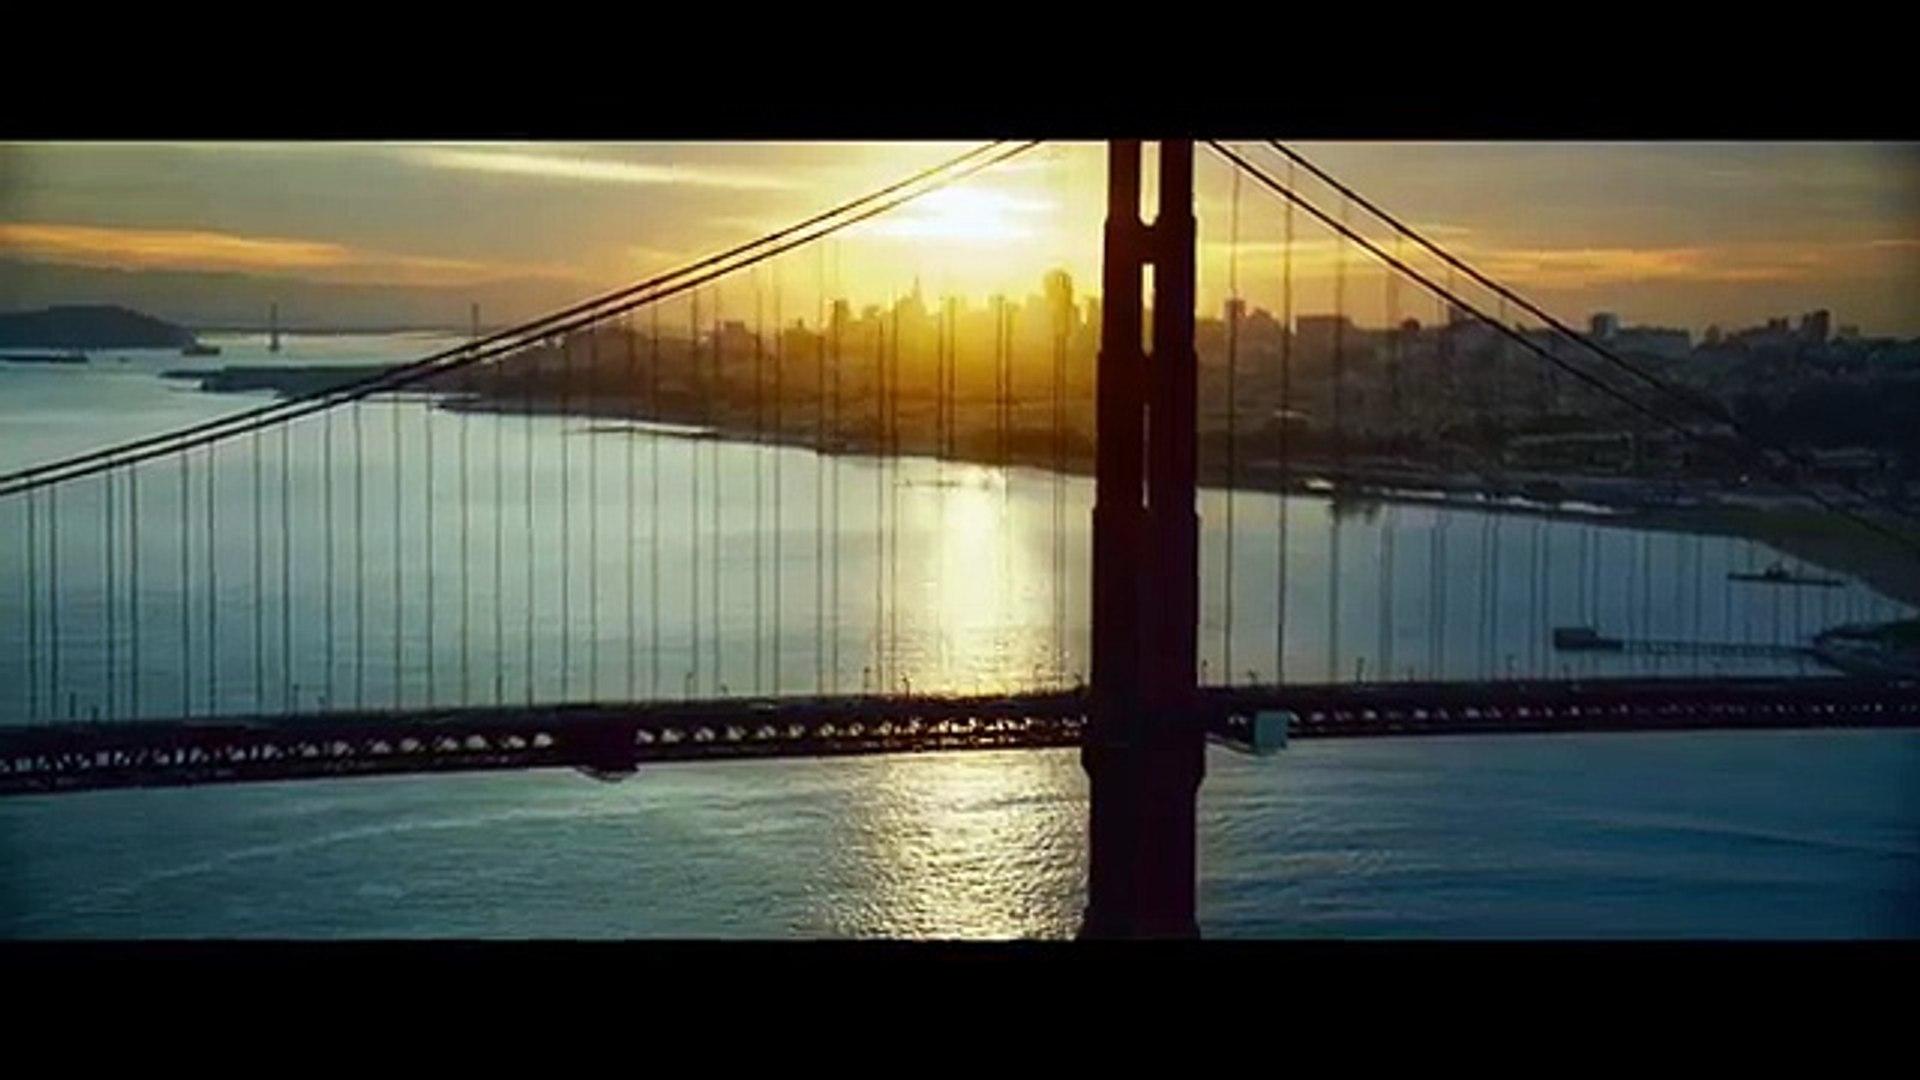 Terminator Genisys Movie - movie trailers -  Big Game Spot - new movie trailers -